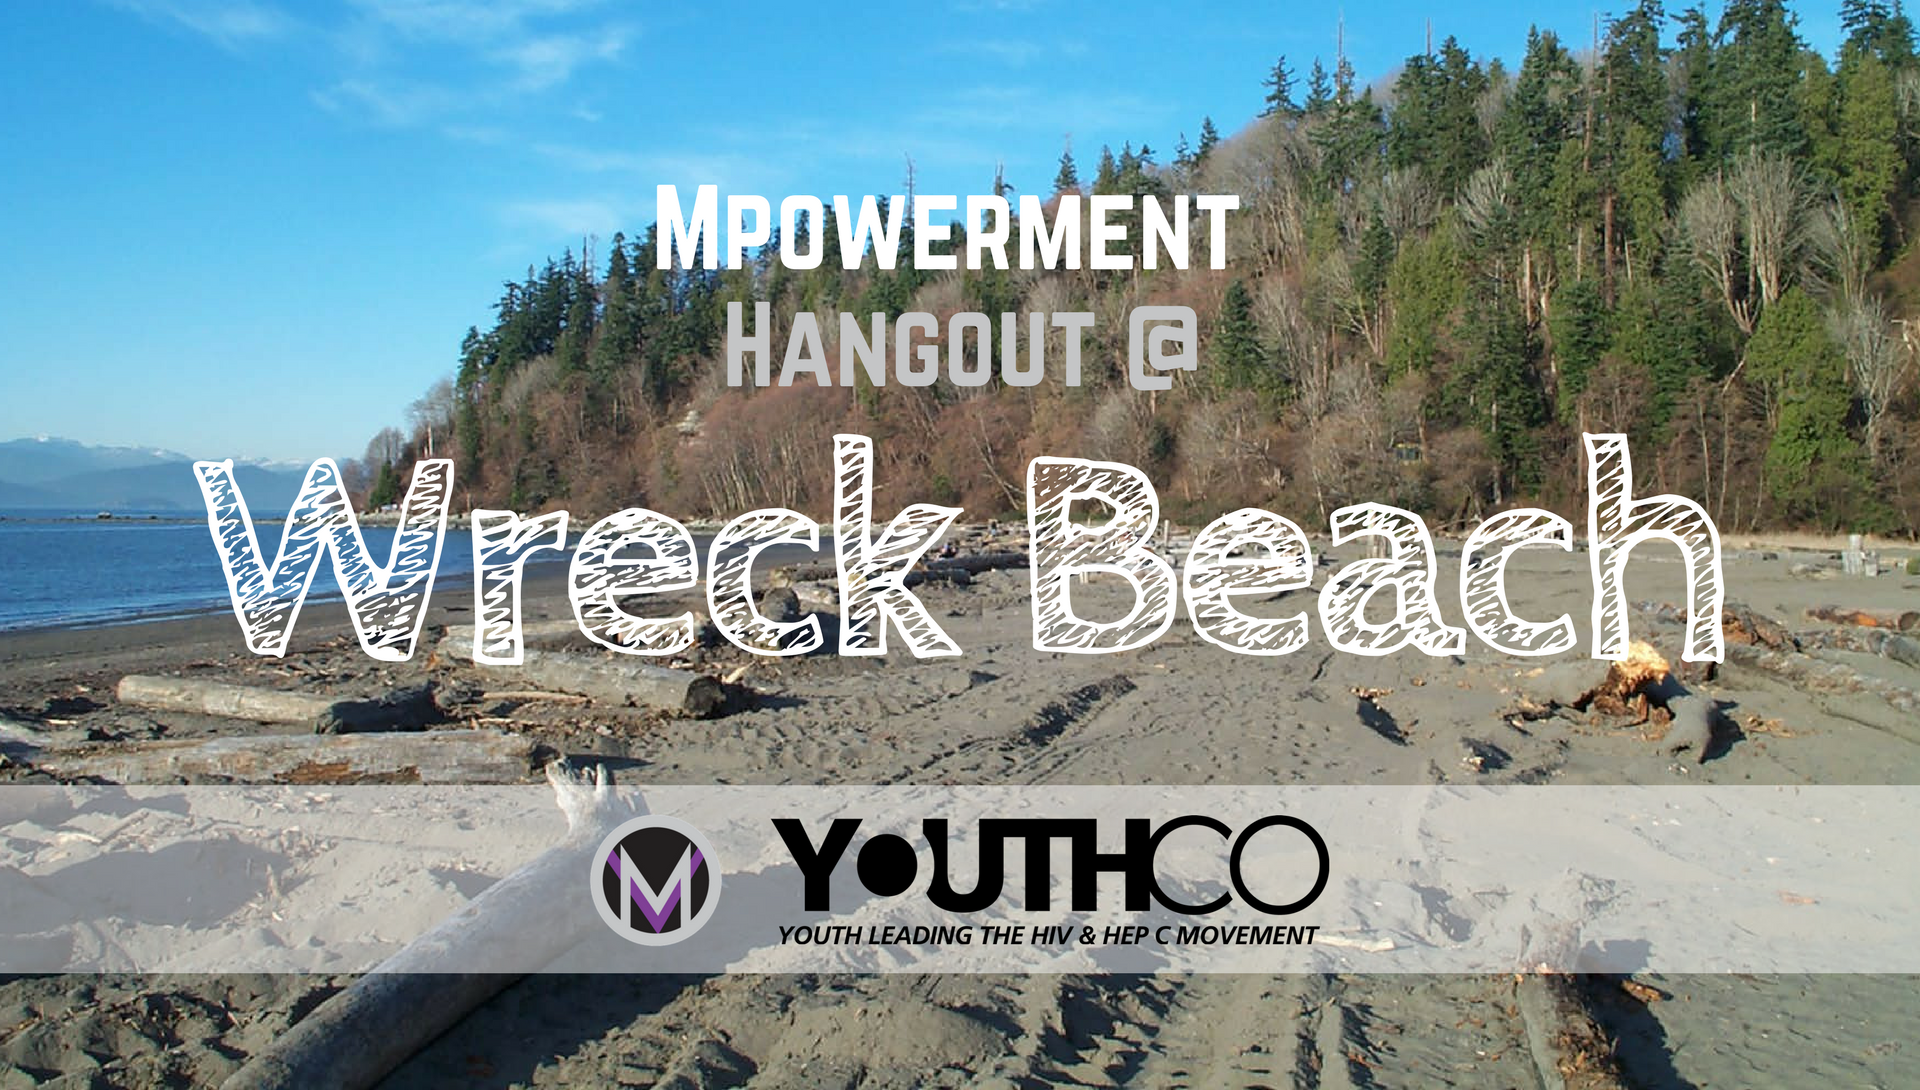 Facebook_Cover_Mpowerment_Wreck_Beach.png